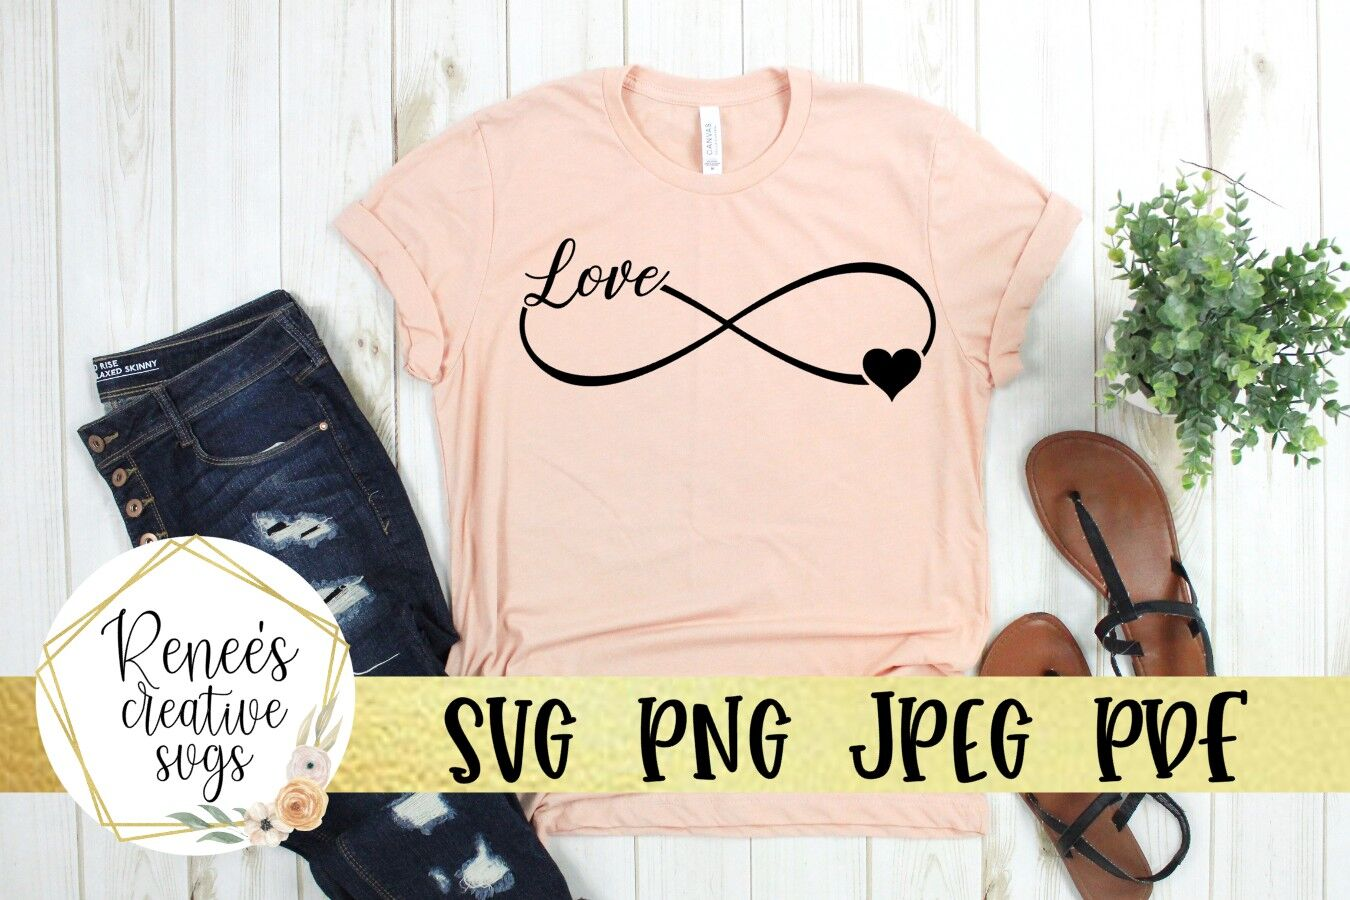 Infinity Love Svg By Renee S Creative Svg S Thehungryjpeg Com